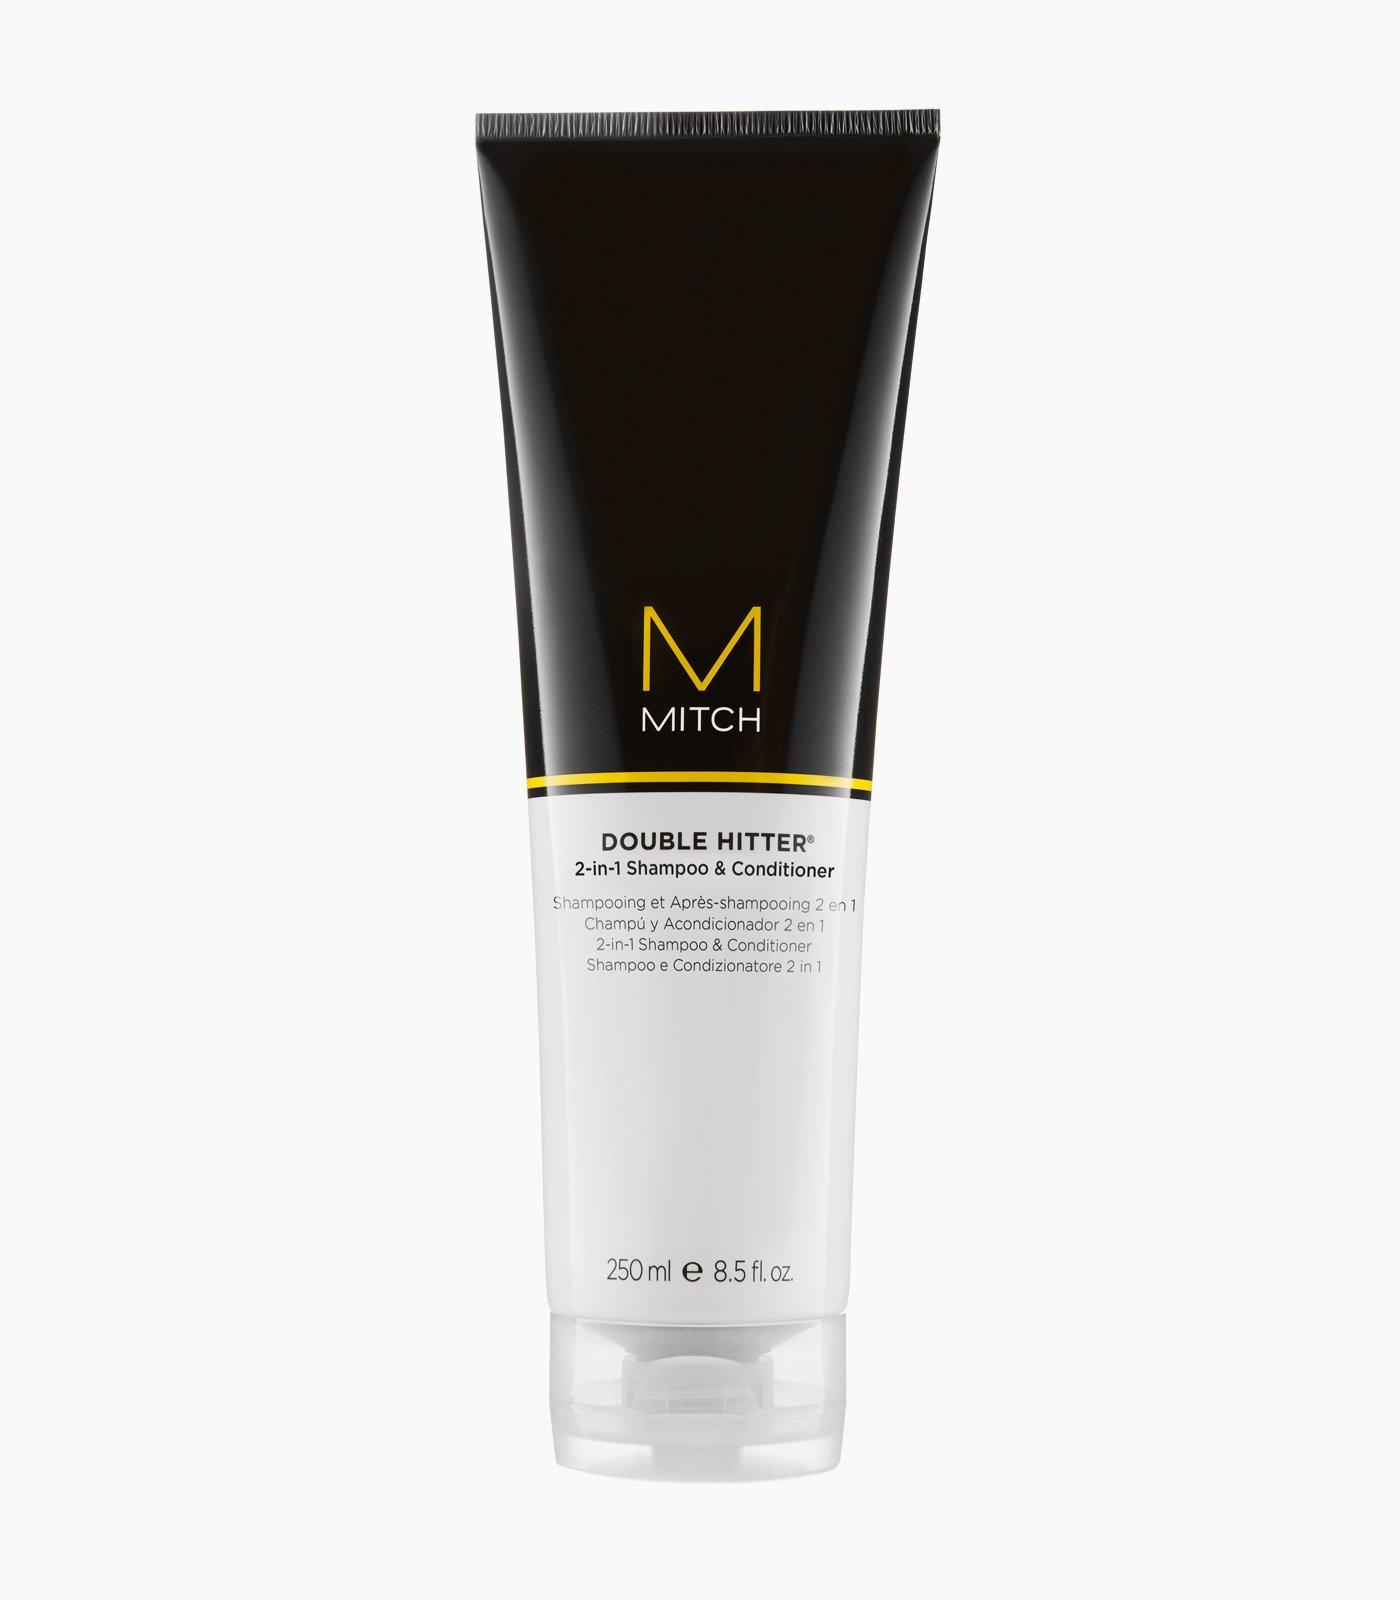 PAUL MITCHELL CLEAN BEAUTY MITCH Double Hitter Shampoo 250 ml